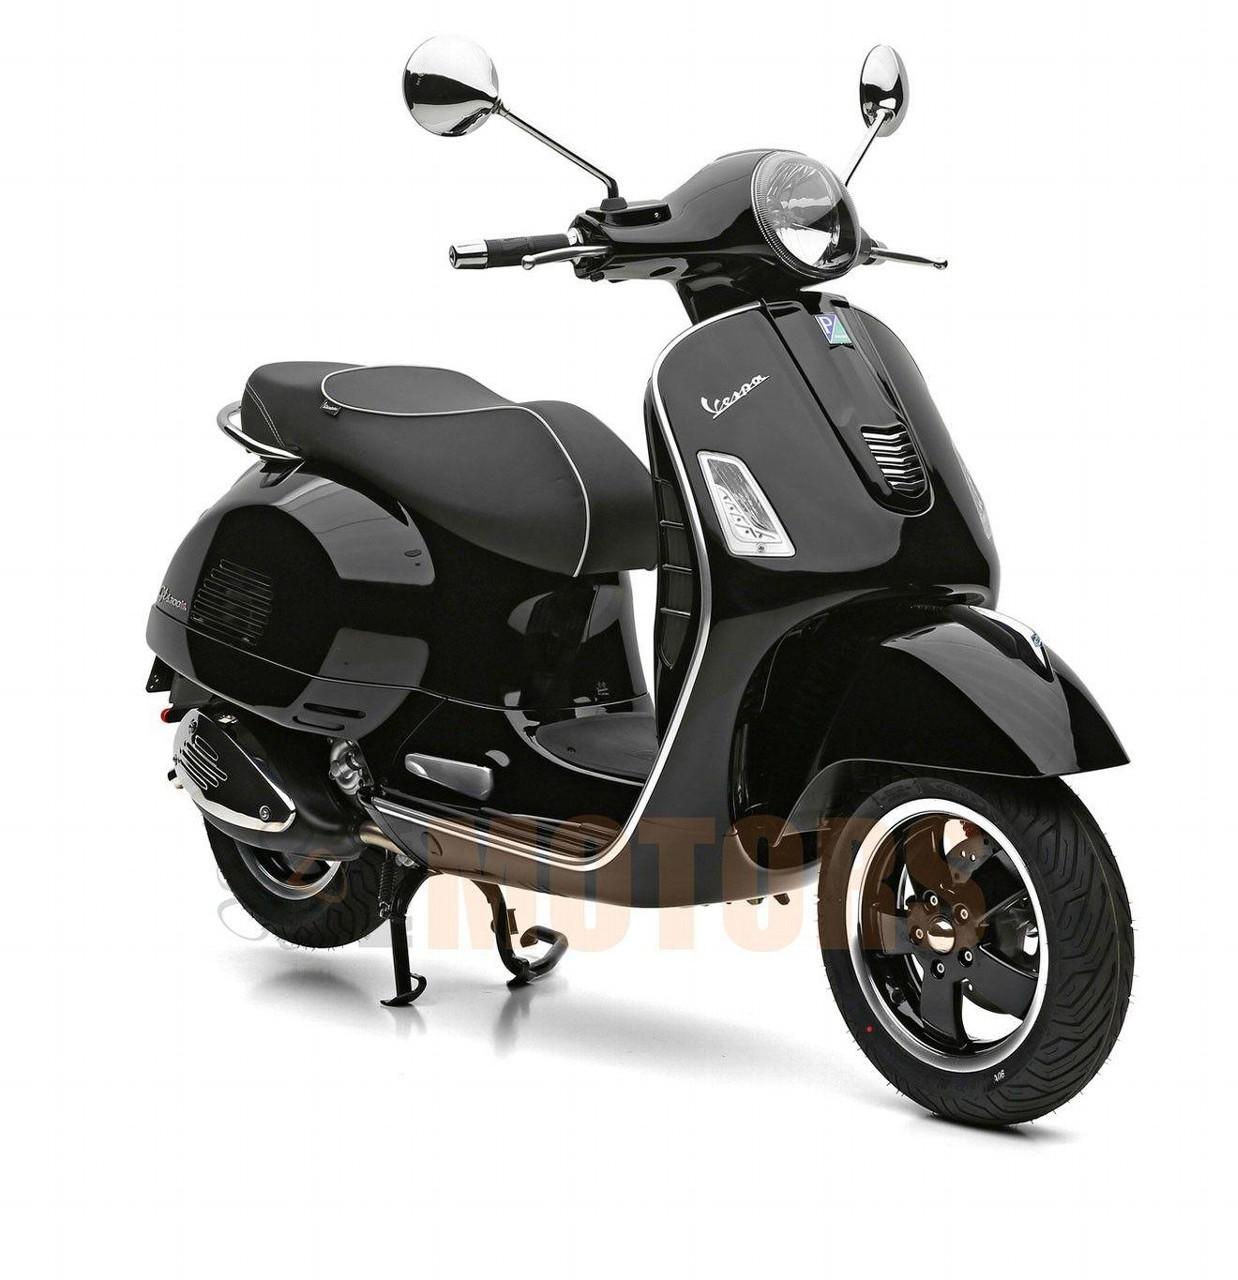 Motorrad Mieten & Roller Mieten PIAGGIO Vespa GTS 300 HPE